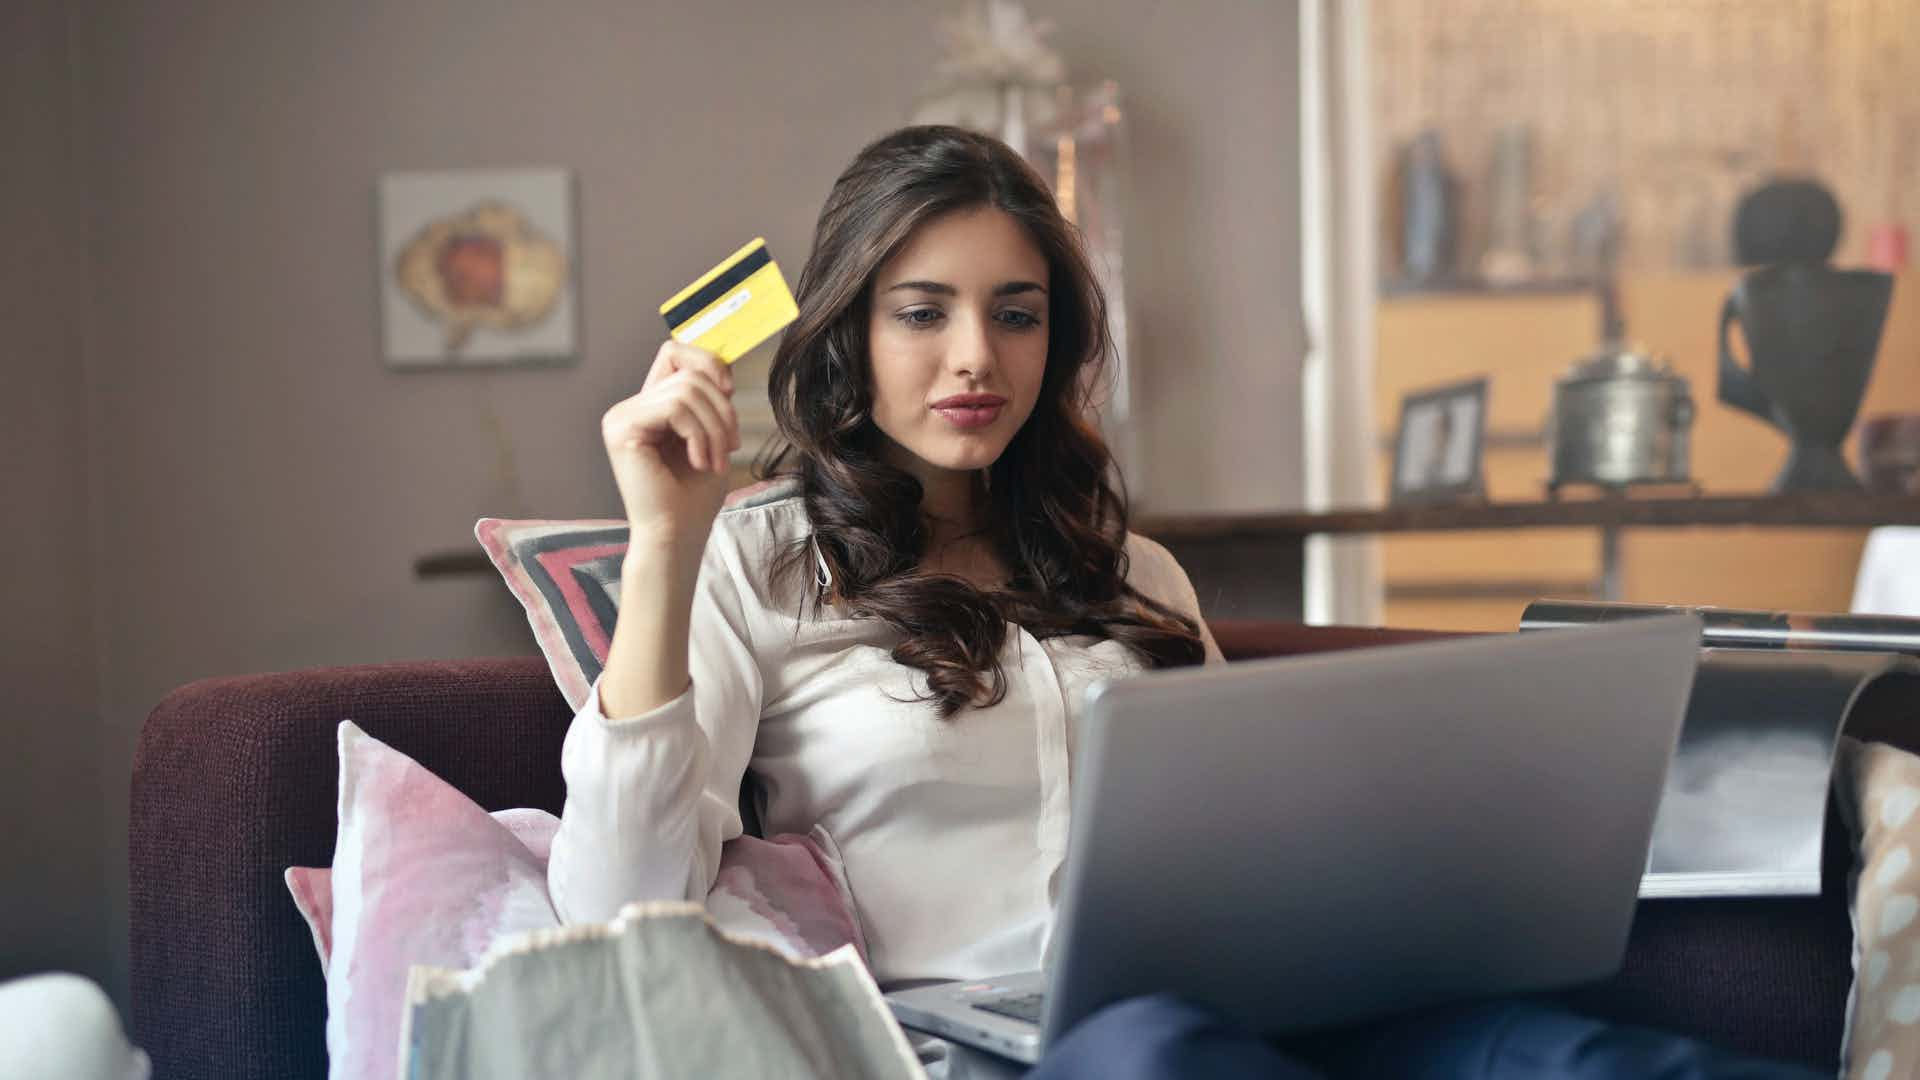 Consumentenrecht nodig